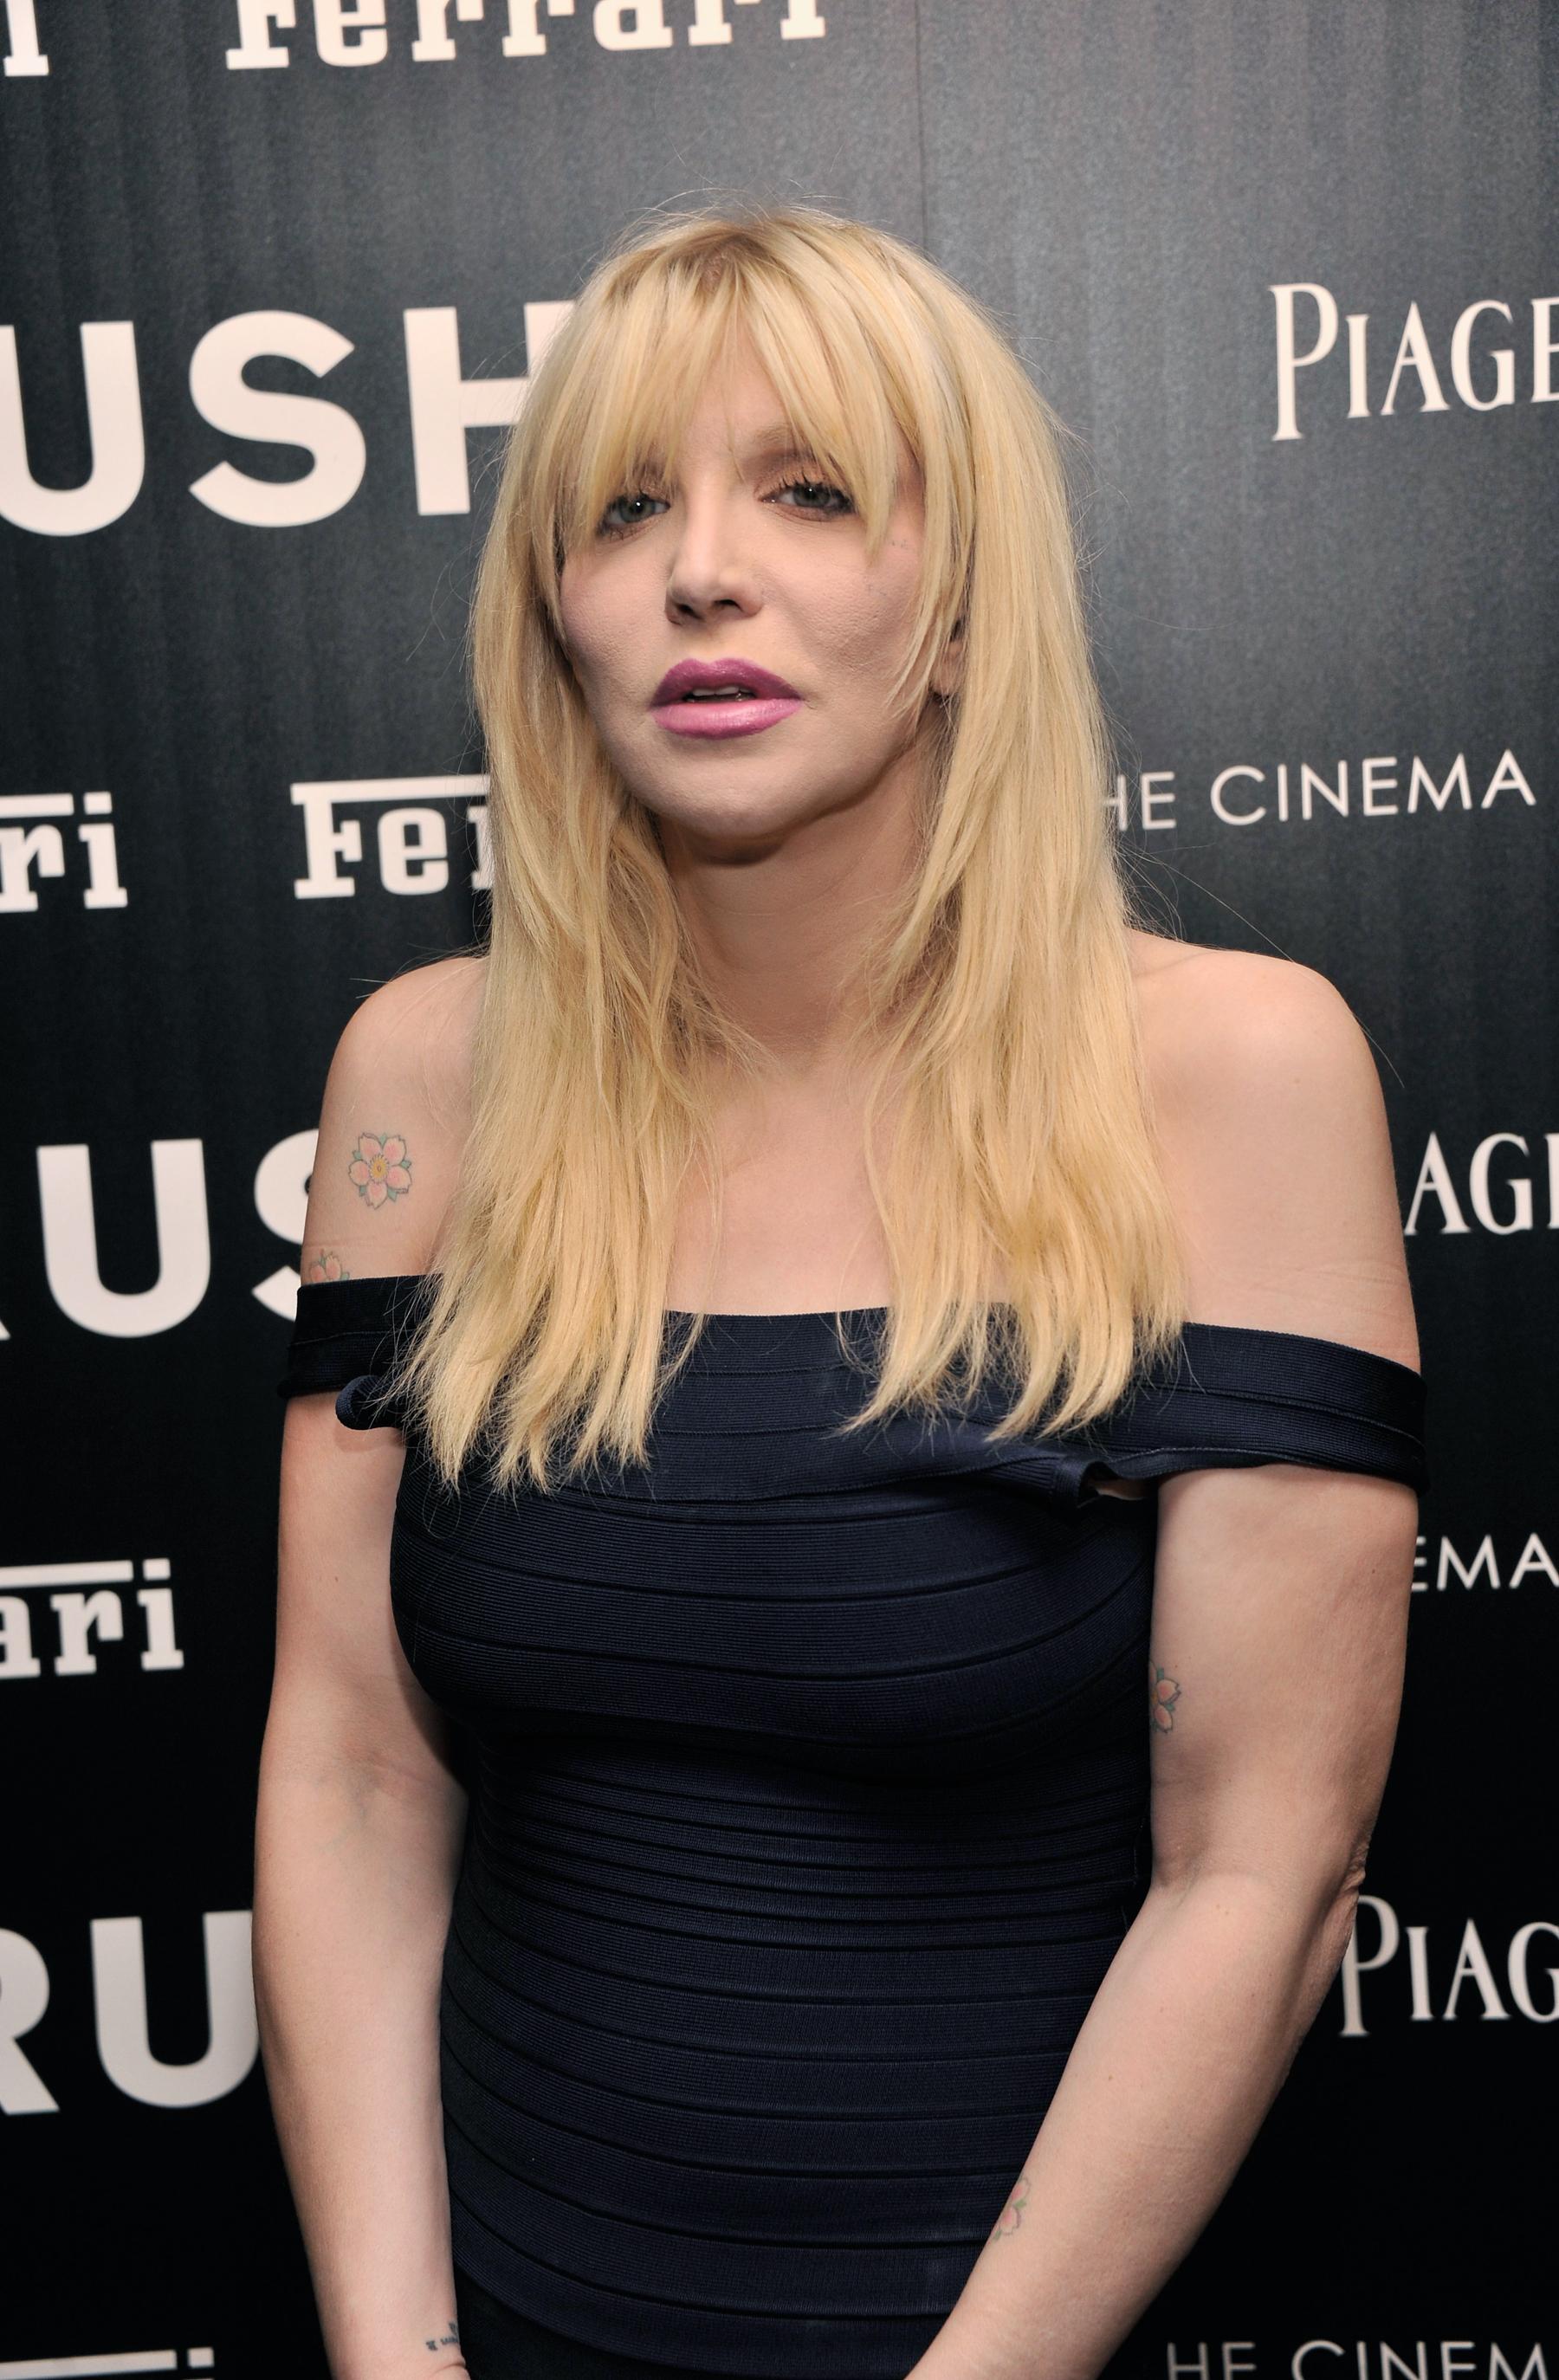 Courtney Love Cries in Court Over Mishandling of Kurt Cobain's Memory